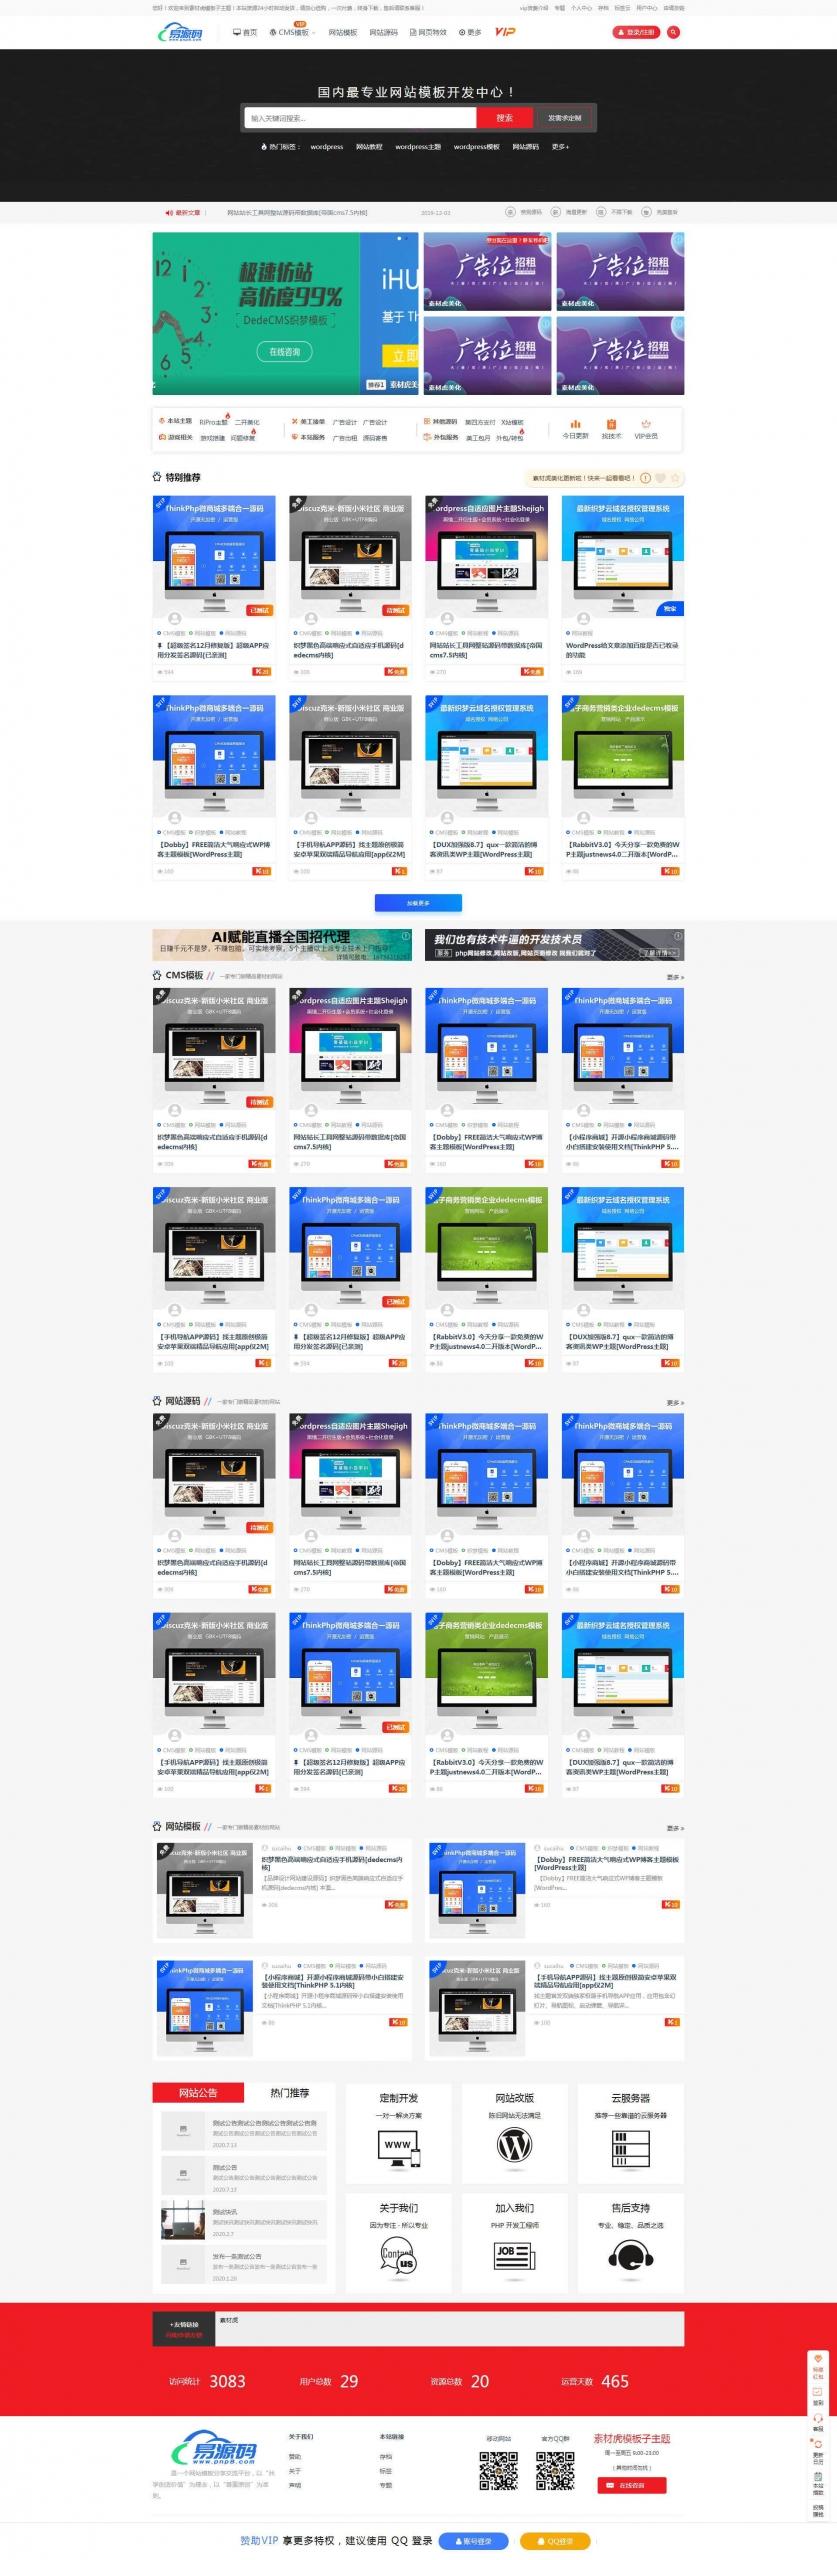 RiPro主题美化moban-child模板子主题原创美化包(适用于各类资源下载站)-一天源码